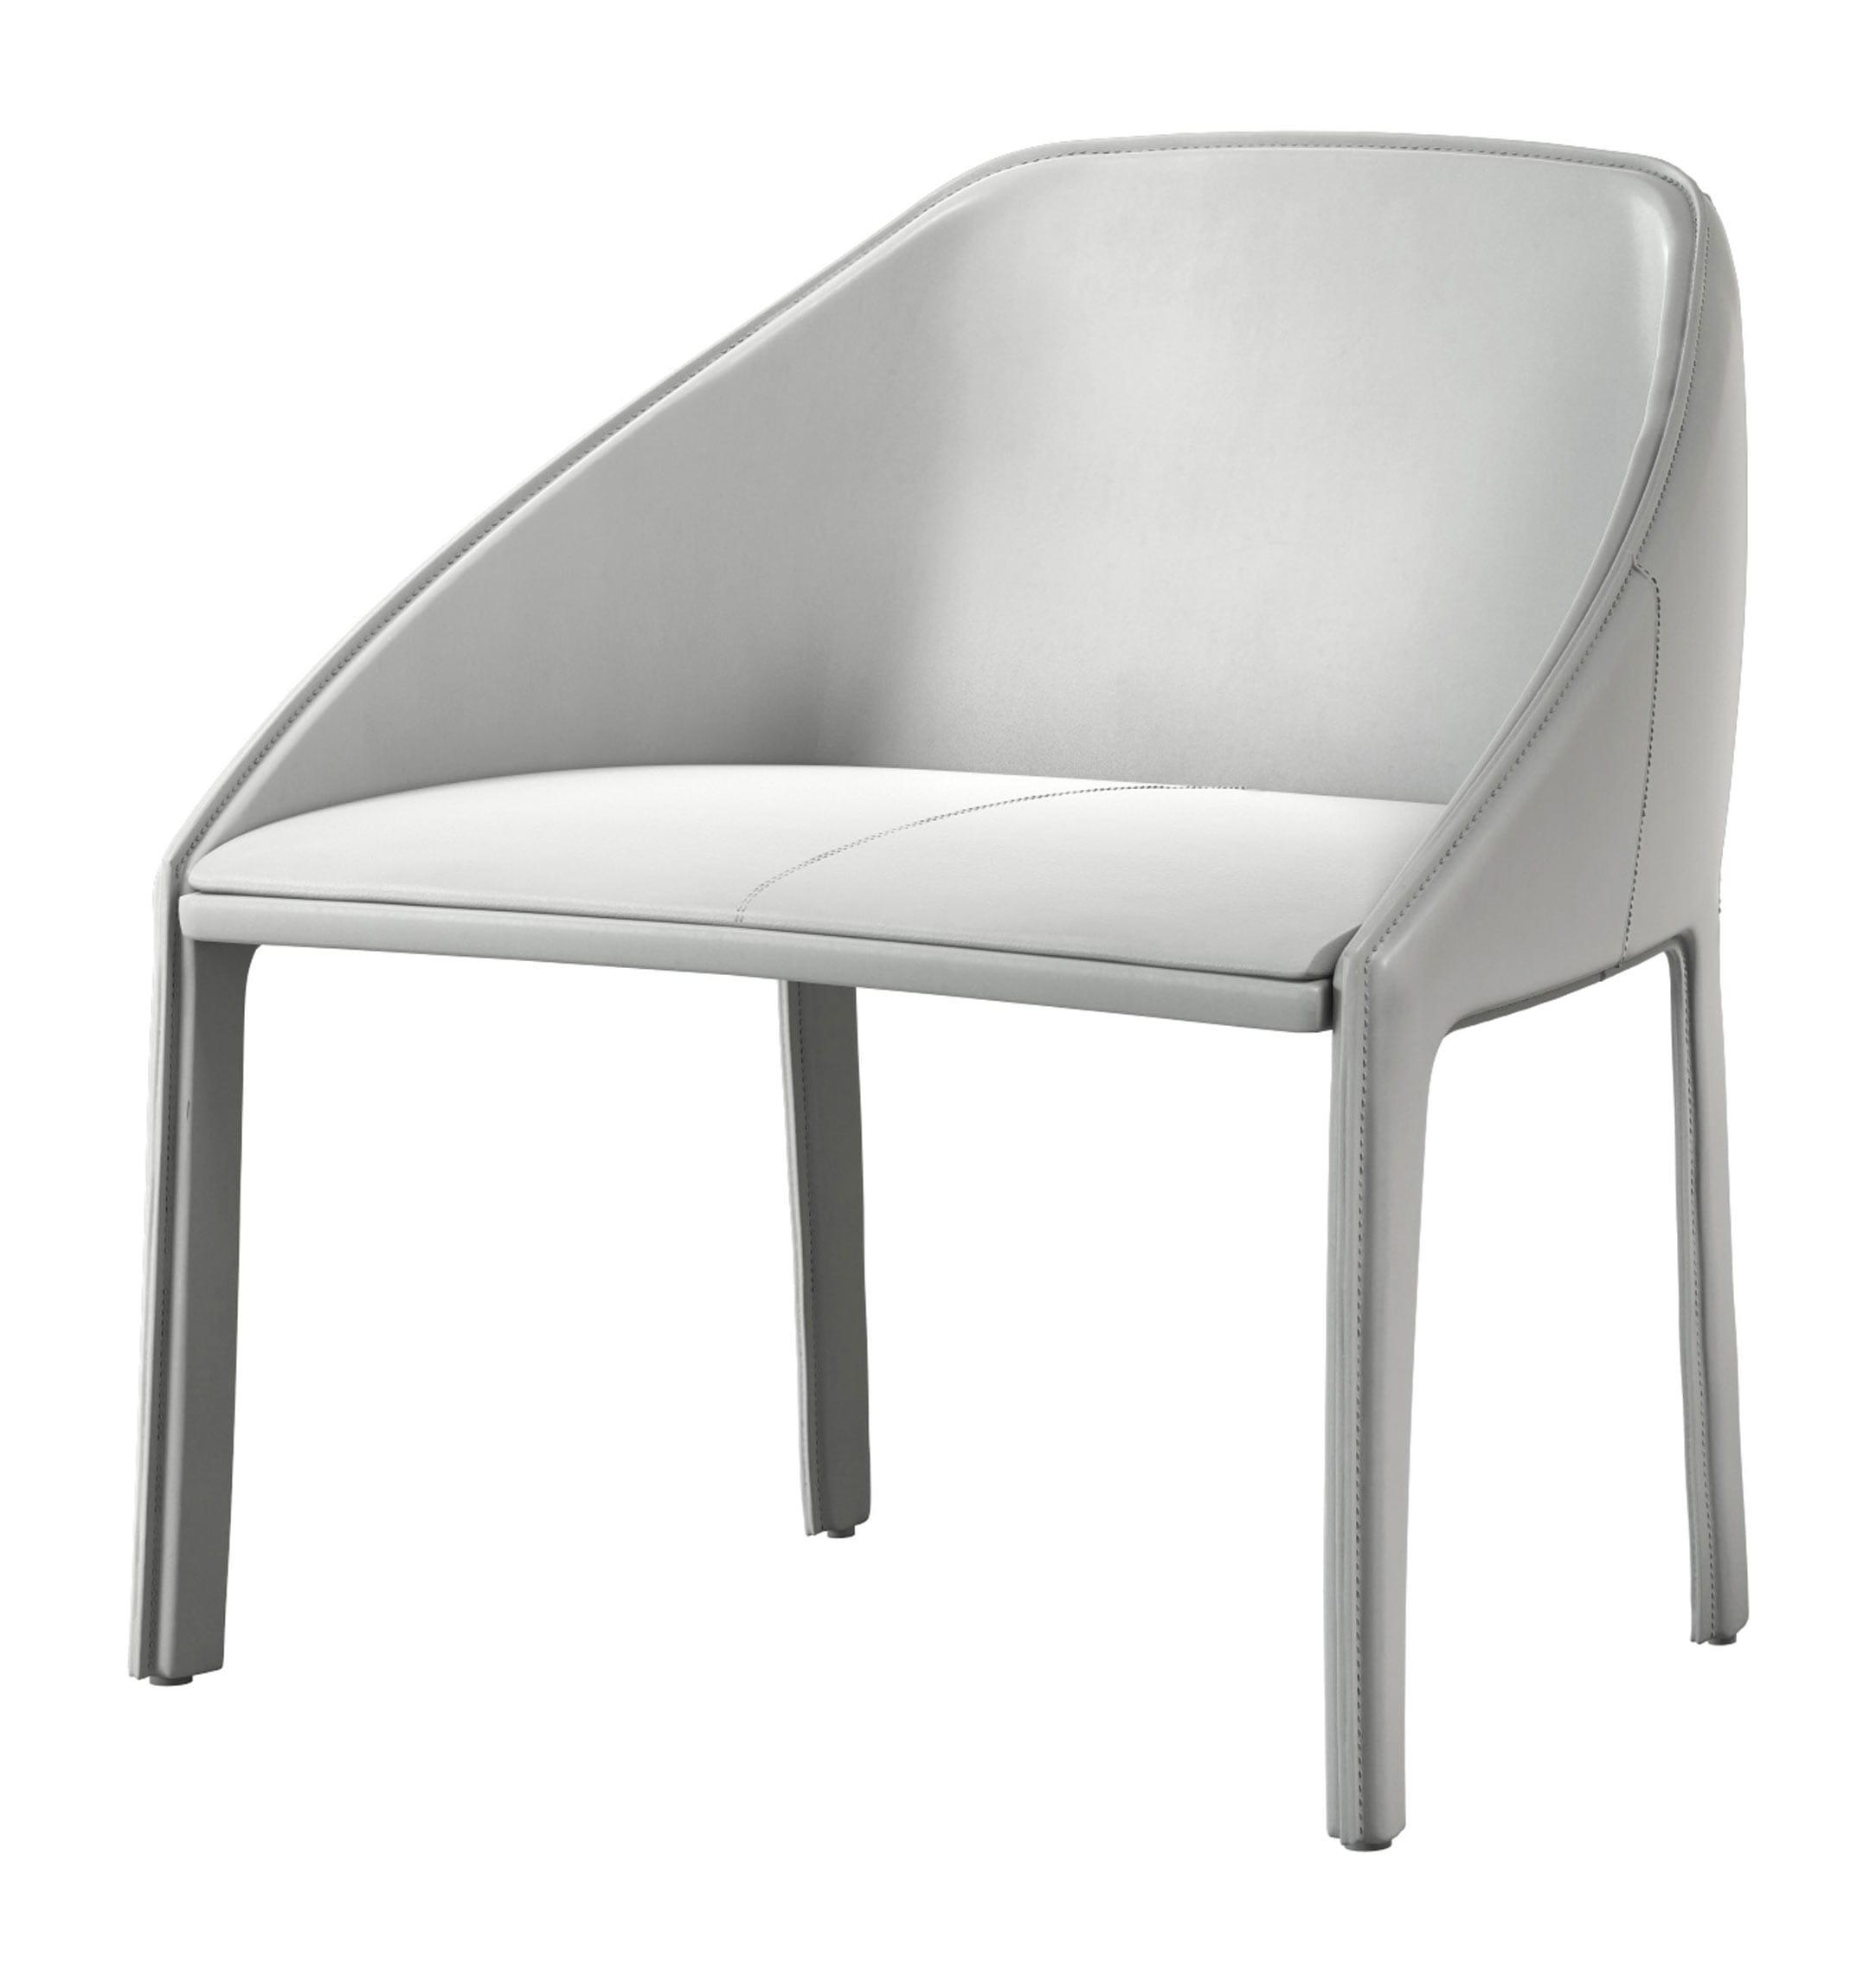 Superb Sidney Lounge Chair Bright White By Modloft Machost Co Dining Chair Design Ideas Machostcouk